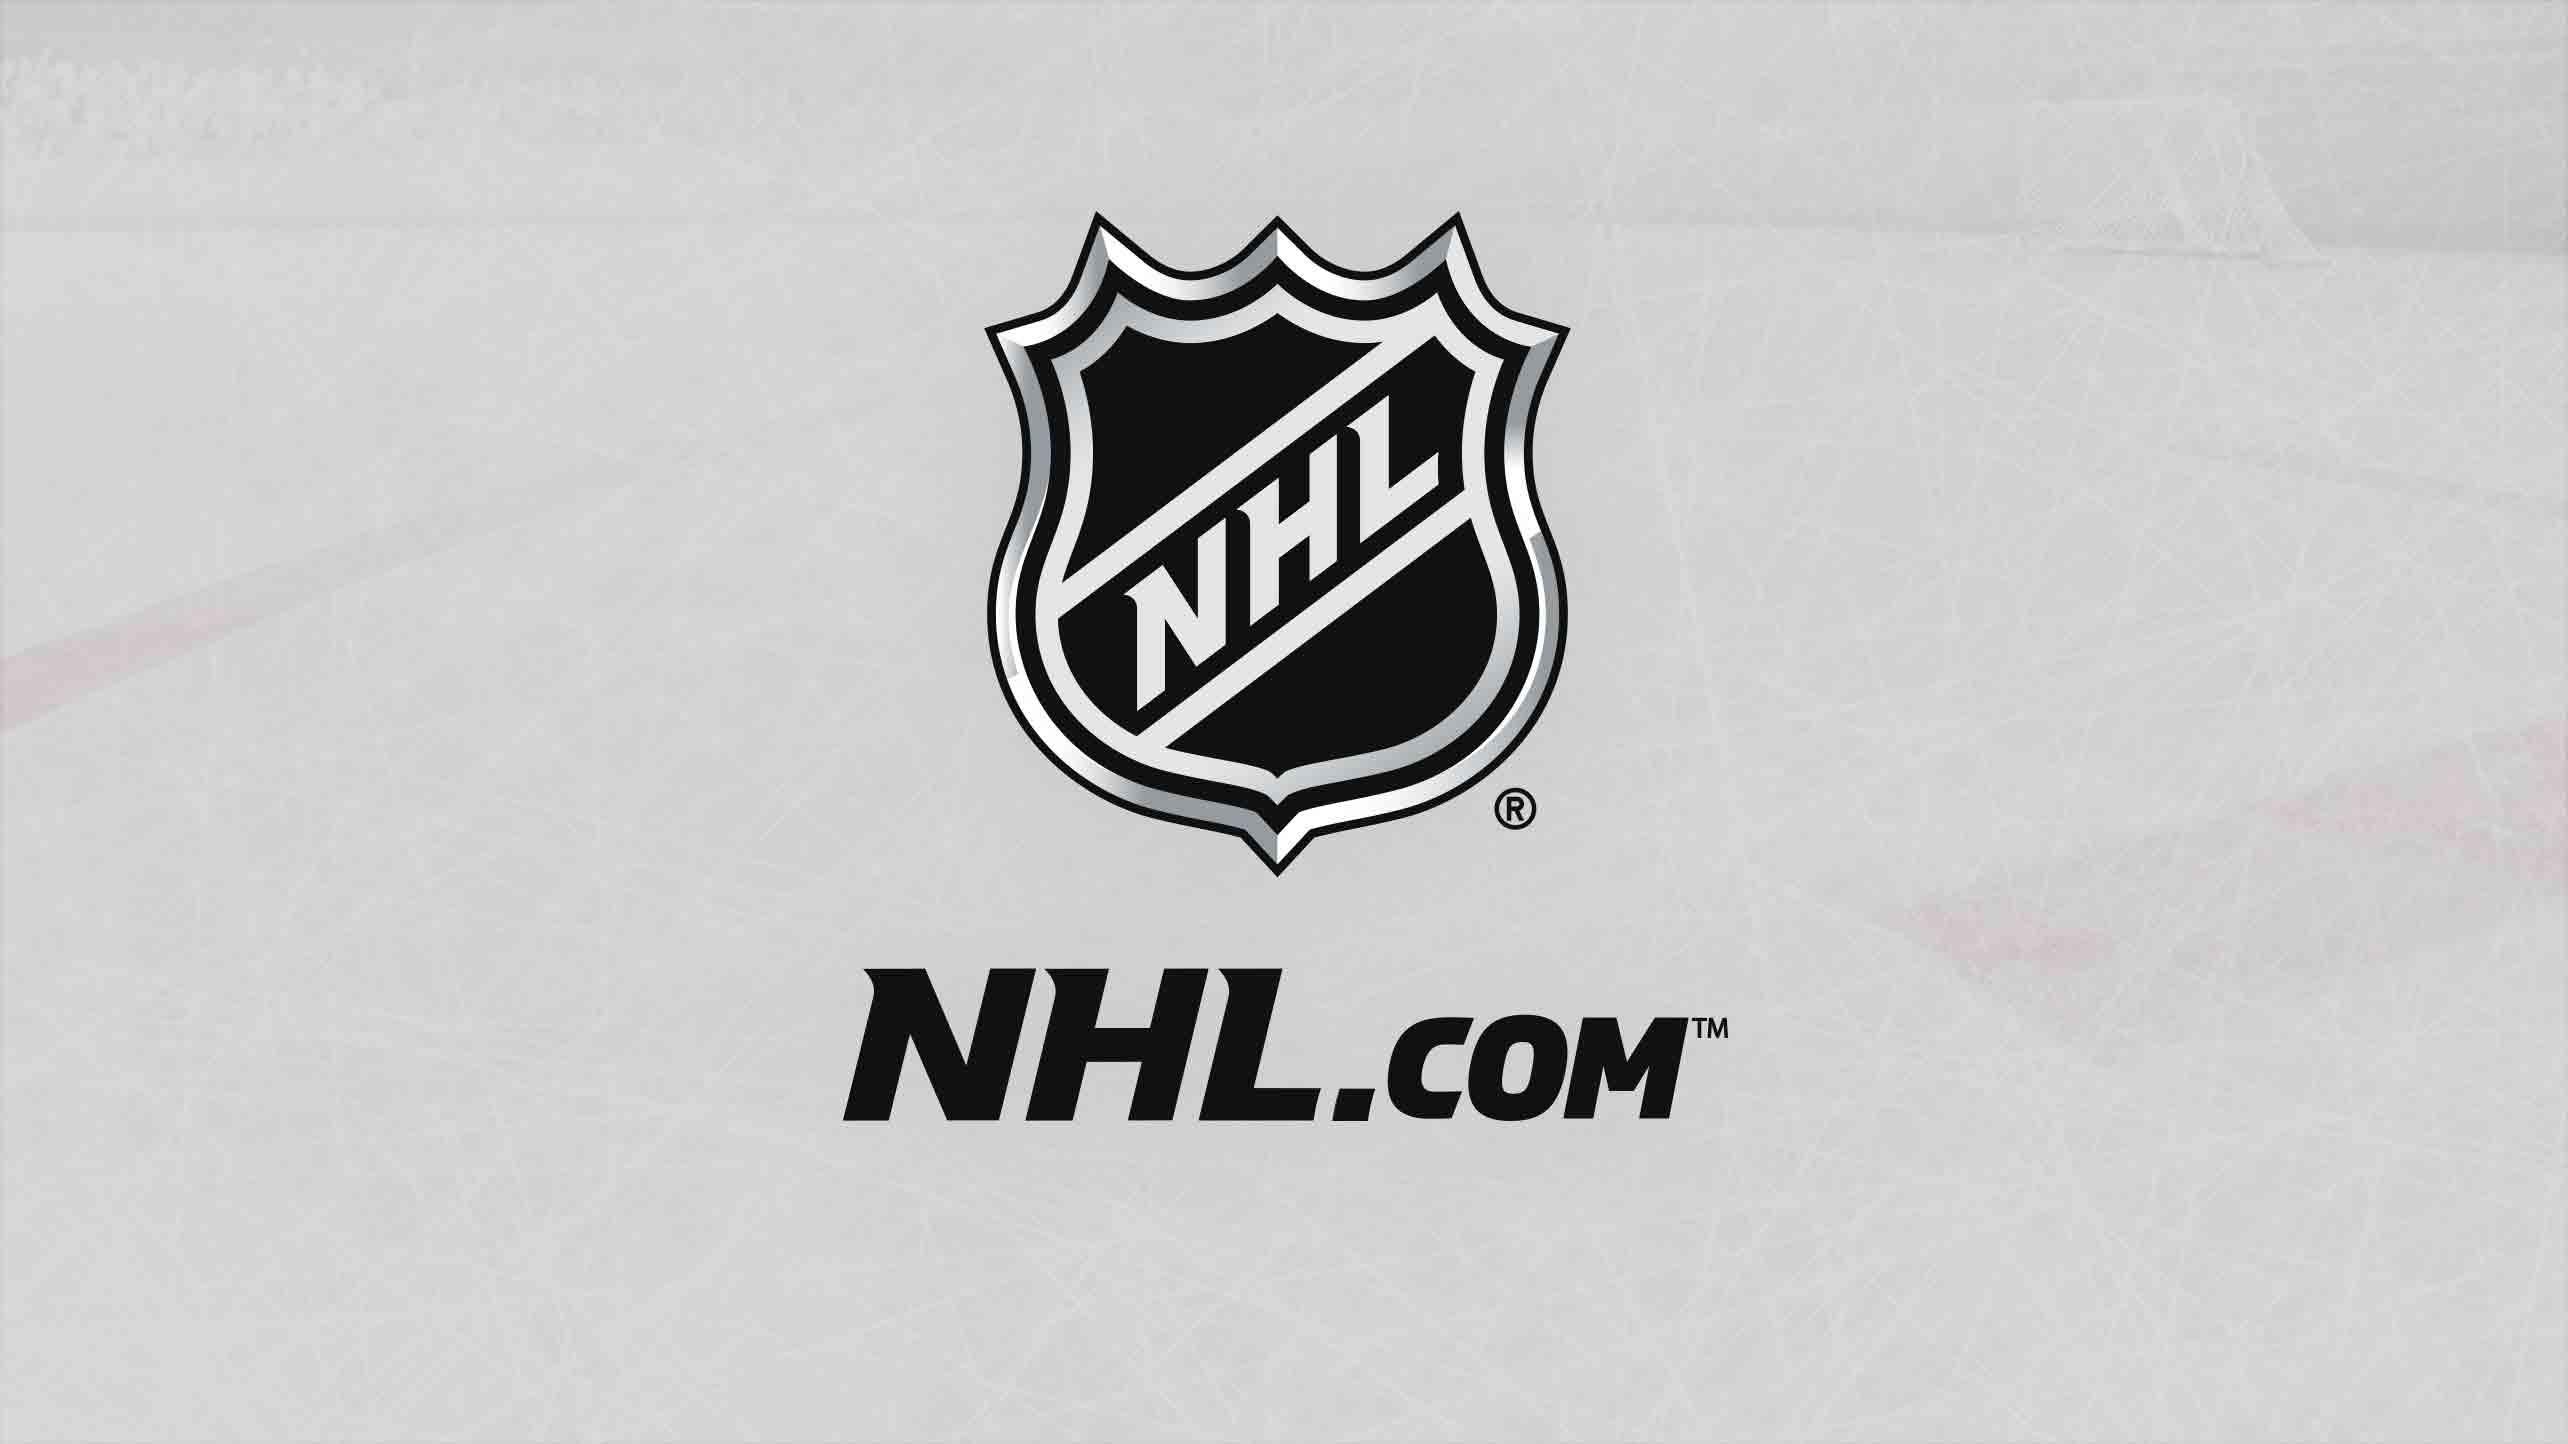 Blackhawks goalie Corey Crawford suffers concussion